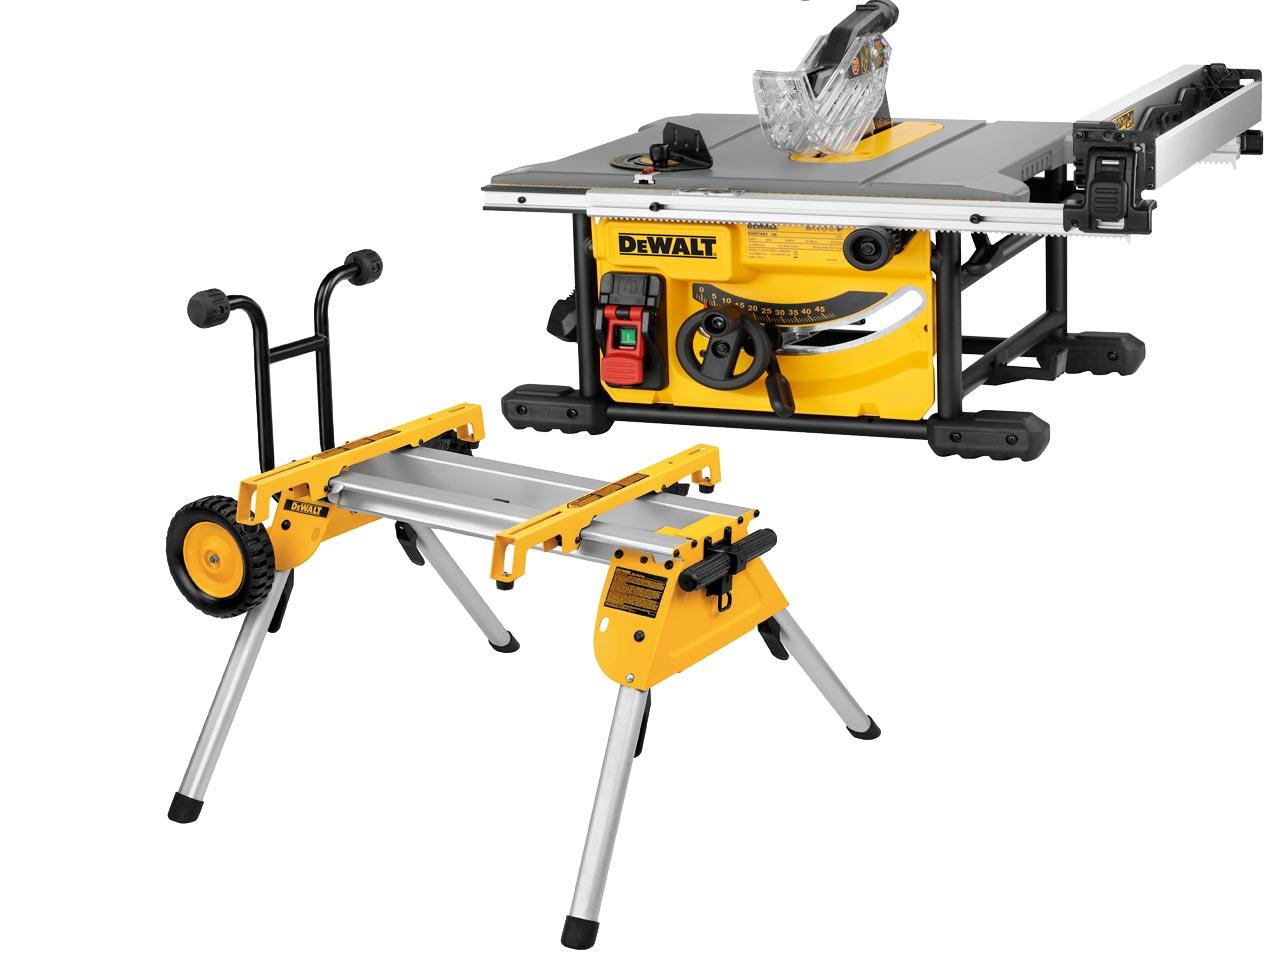 DeWalt DWE7485 & DE7400 240V 210mm Table Saw With Stand Set £549.99 with voucher @ Powertoolmate/Ebay